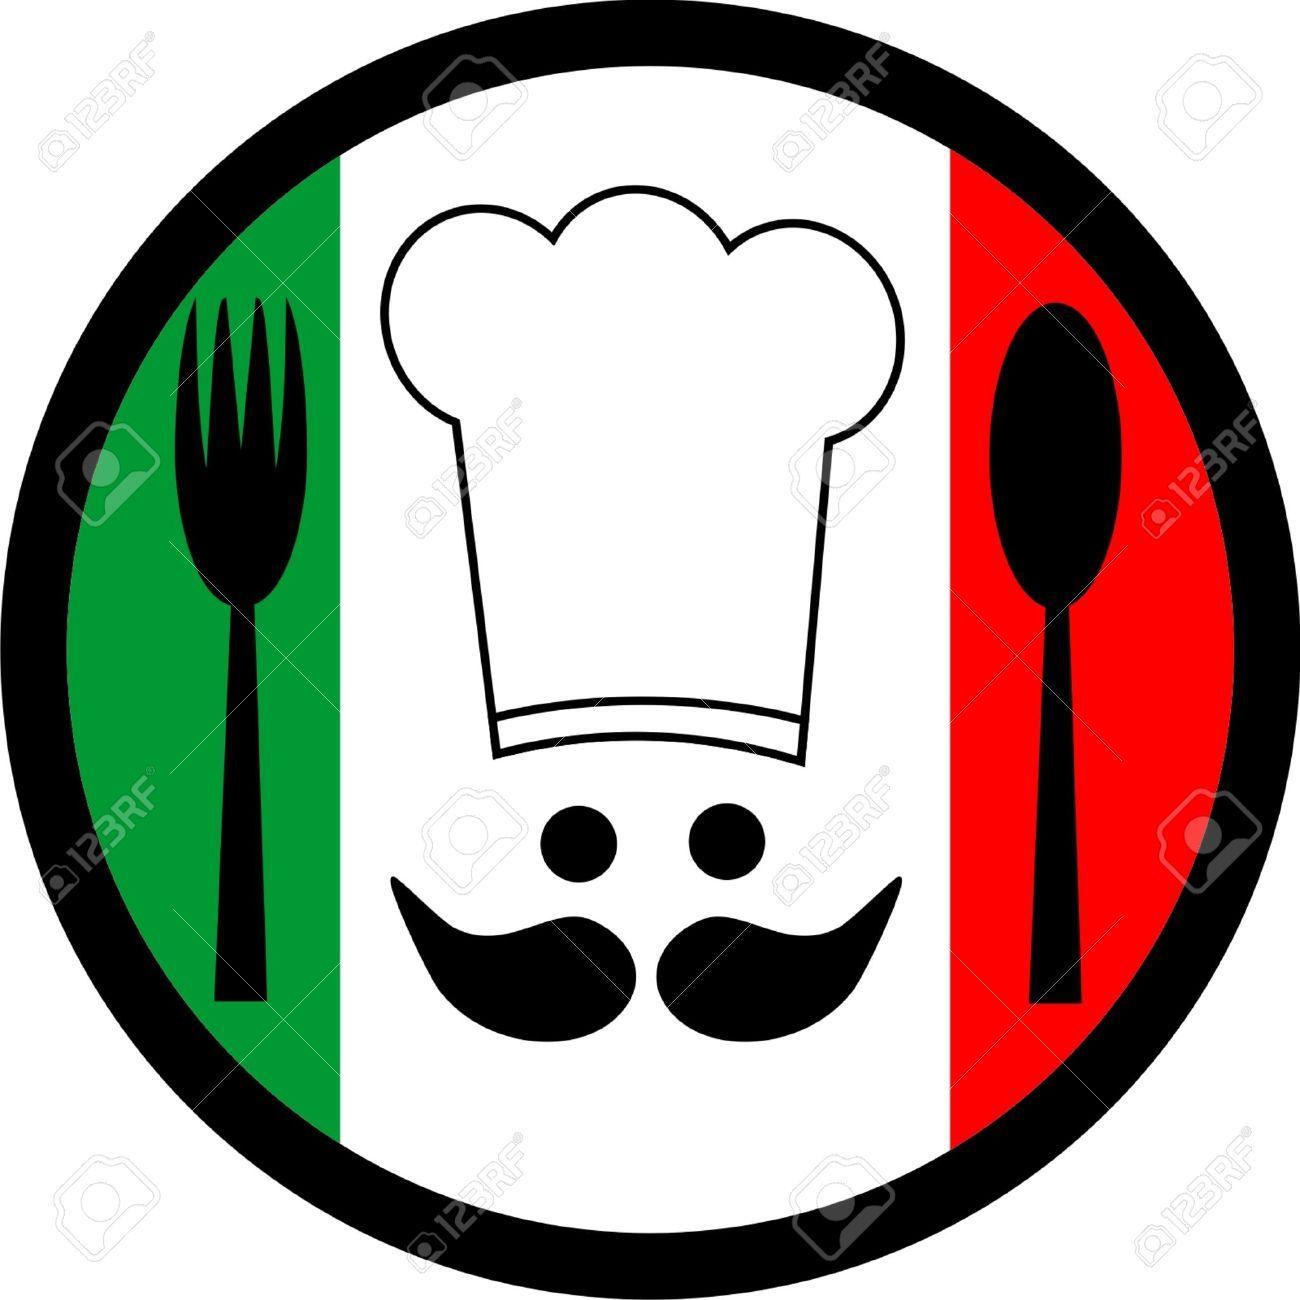 Italian food clipart free 6 » Clipart Portal.